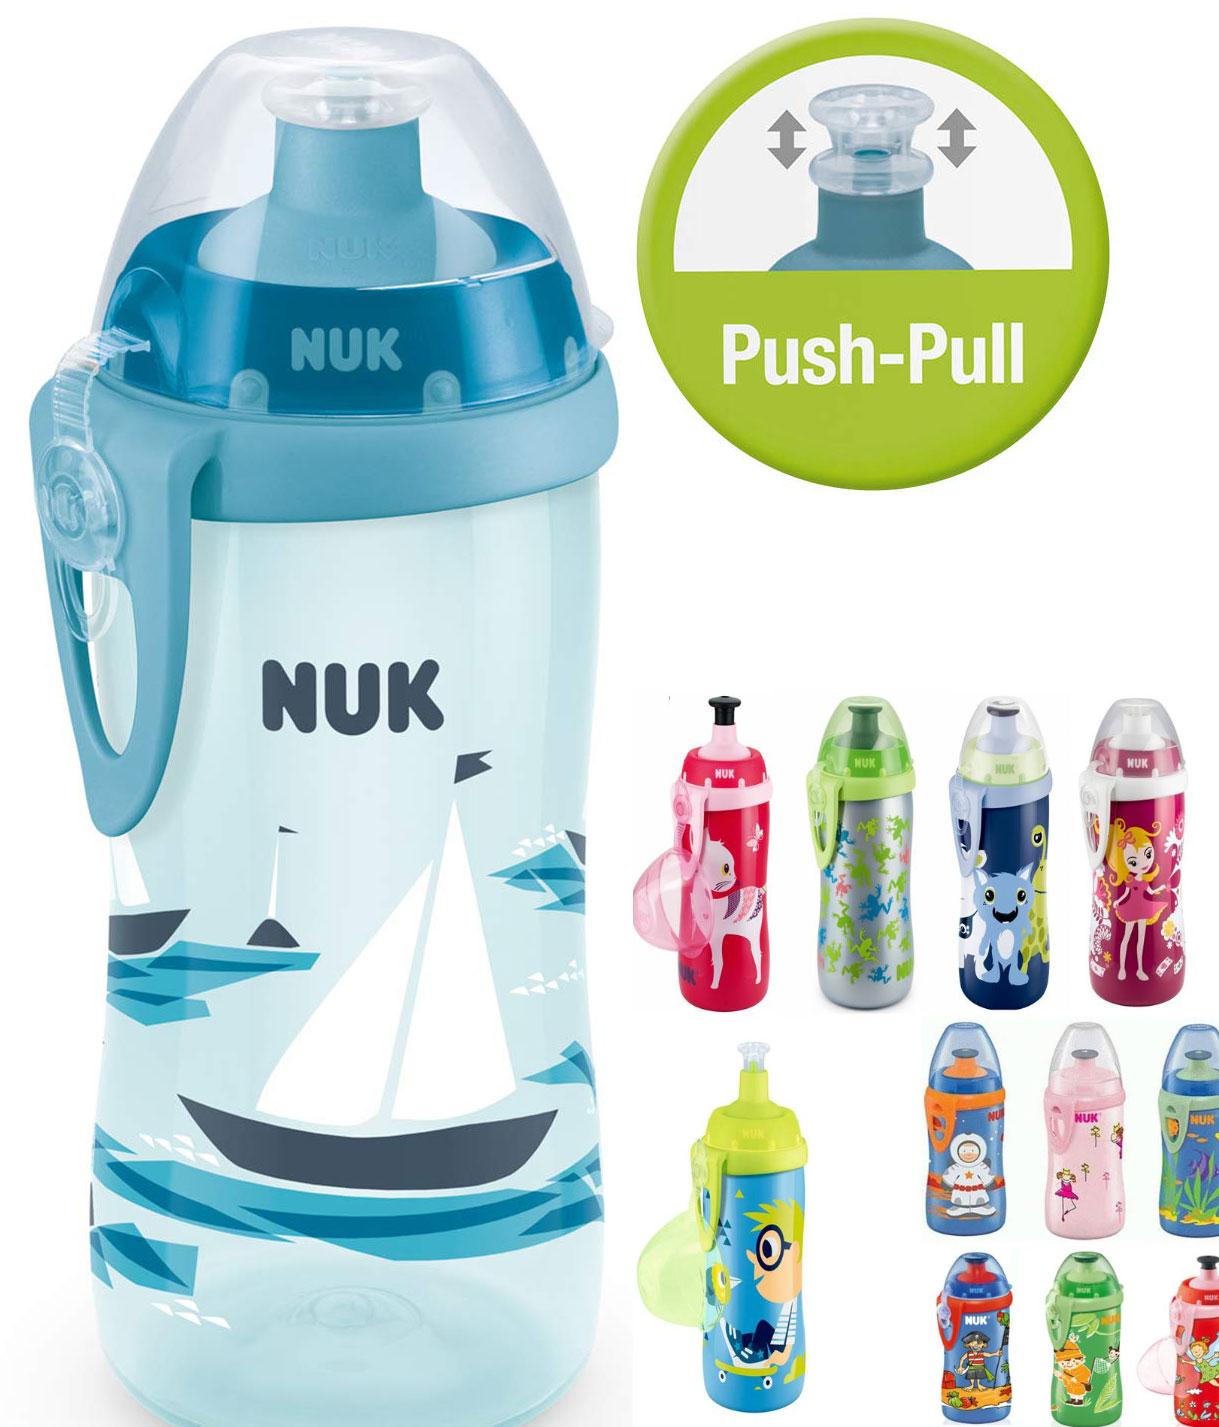 NUK Junior Cup - 300ml Trinklernflasche mit Push-Pull-Tülle & Clip / dank App-Coupons